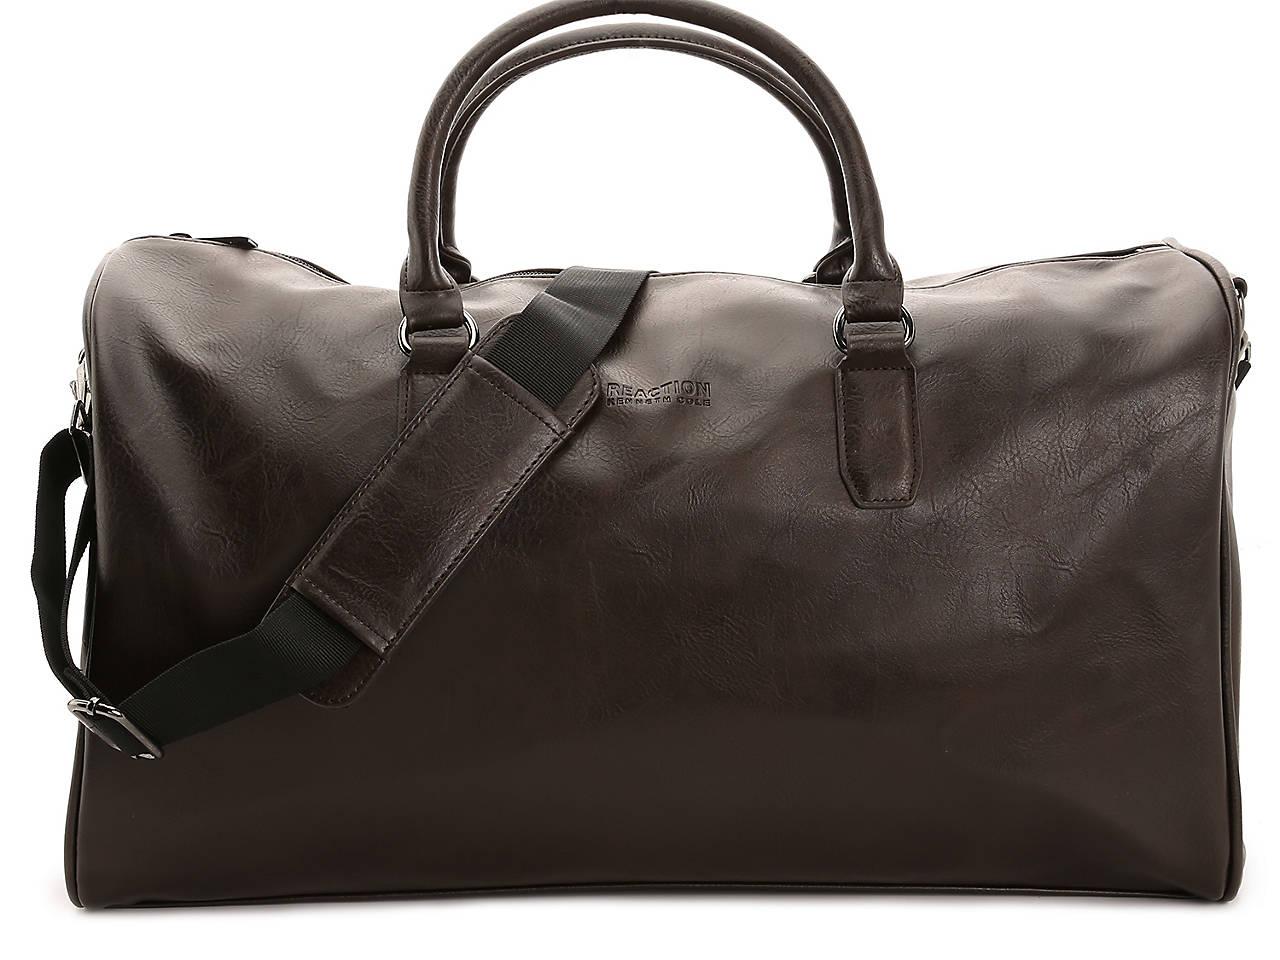 Kenneth Cole Reaction I m Duffed Leather Weekender Bag Men s ... 99c179f08de79